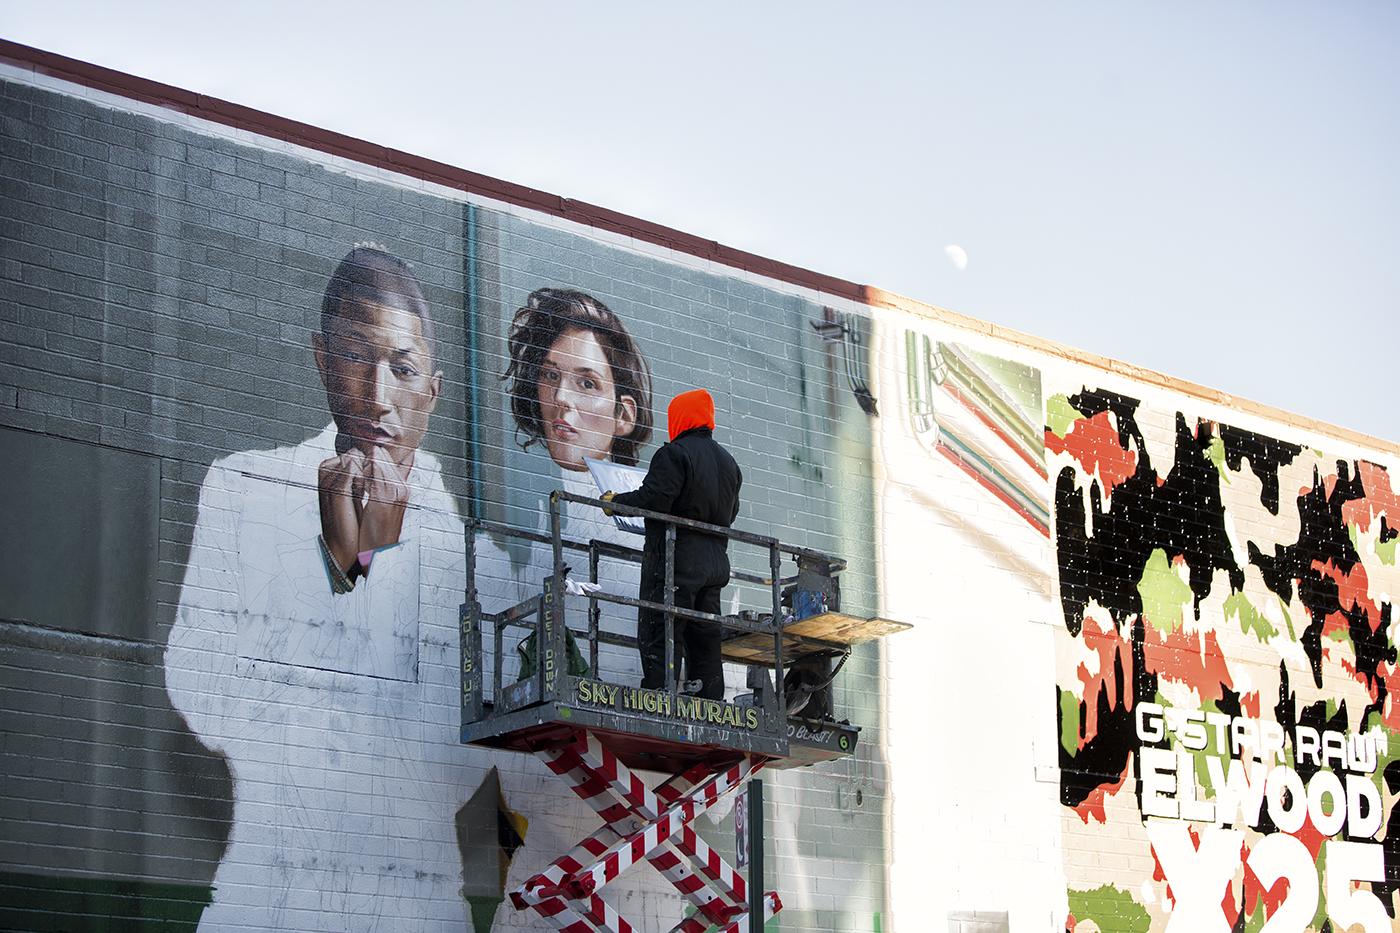 colossal-media-paint-ads-outdoor-advertising-billboard-nyc-new-york-brooklyn-g-star-pharrell-williams-1